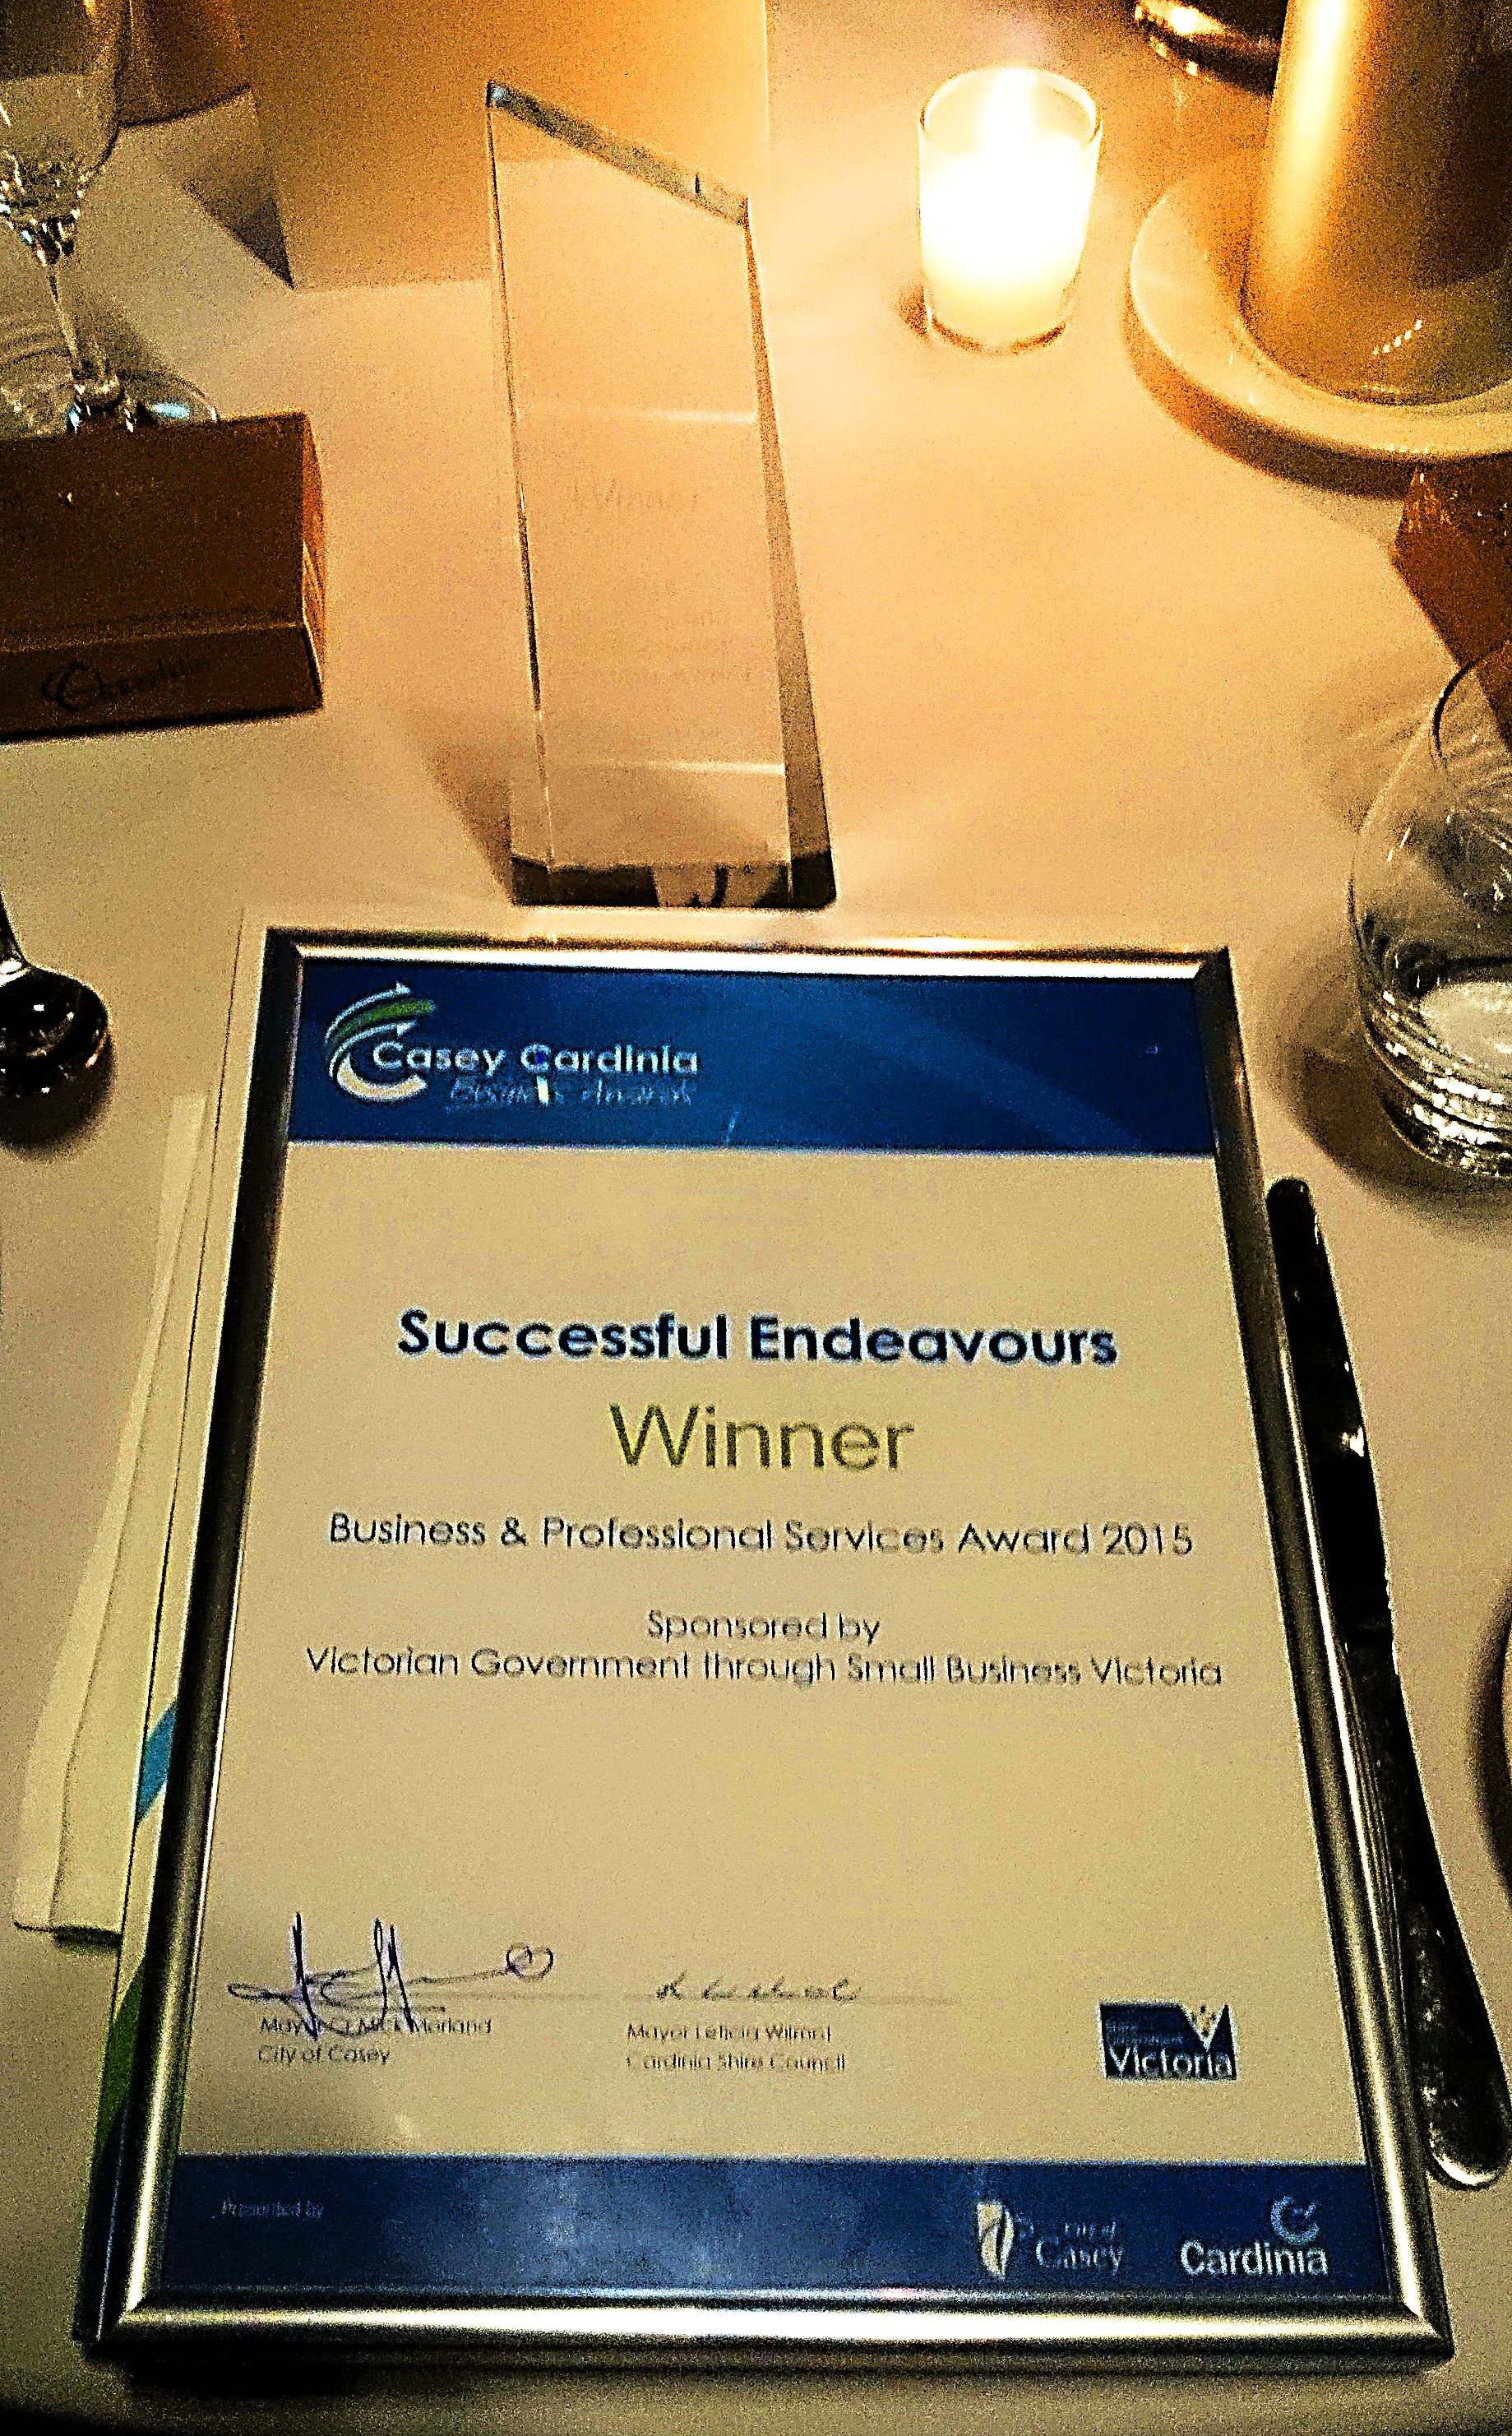 Casey Cardinia Professional Services Award 2015